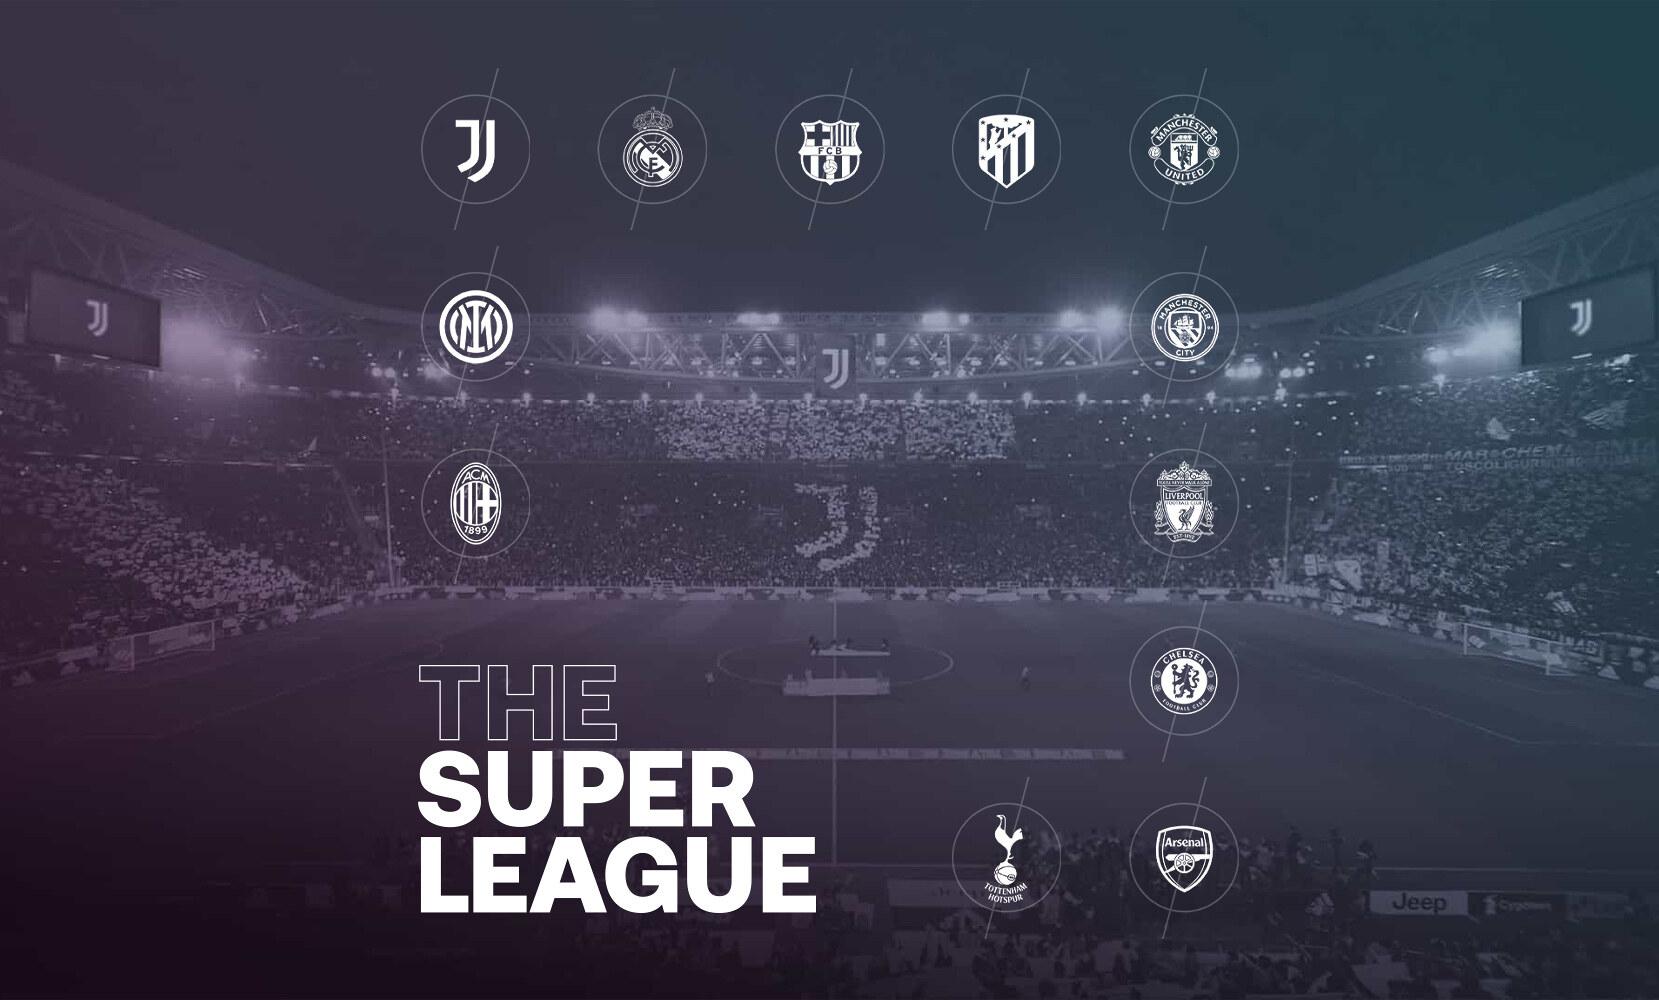 The Super League Best Competition